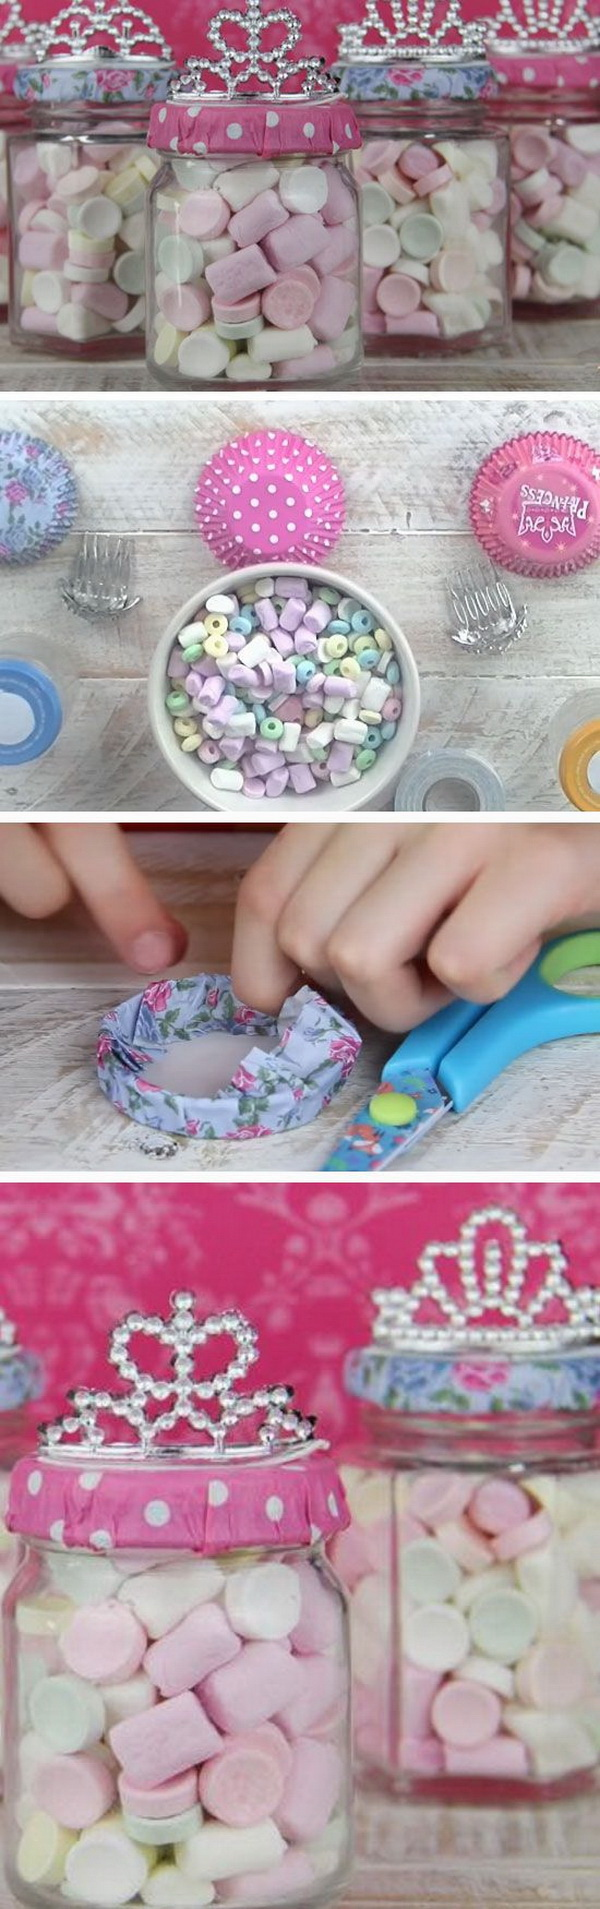 Princess Party Treat Jars.